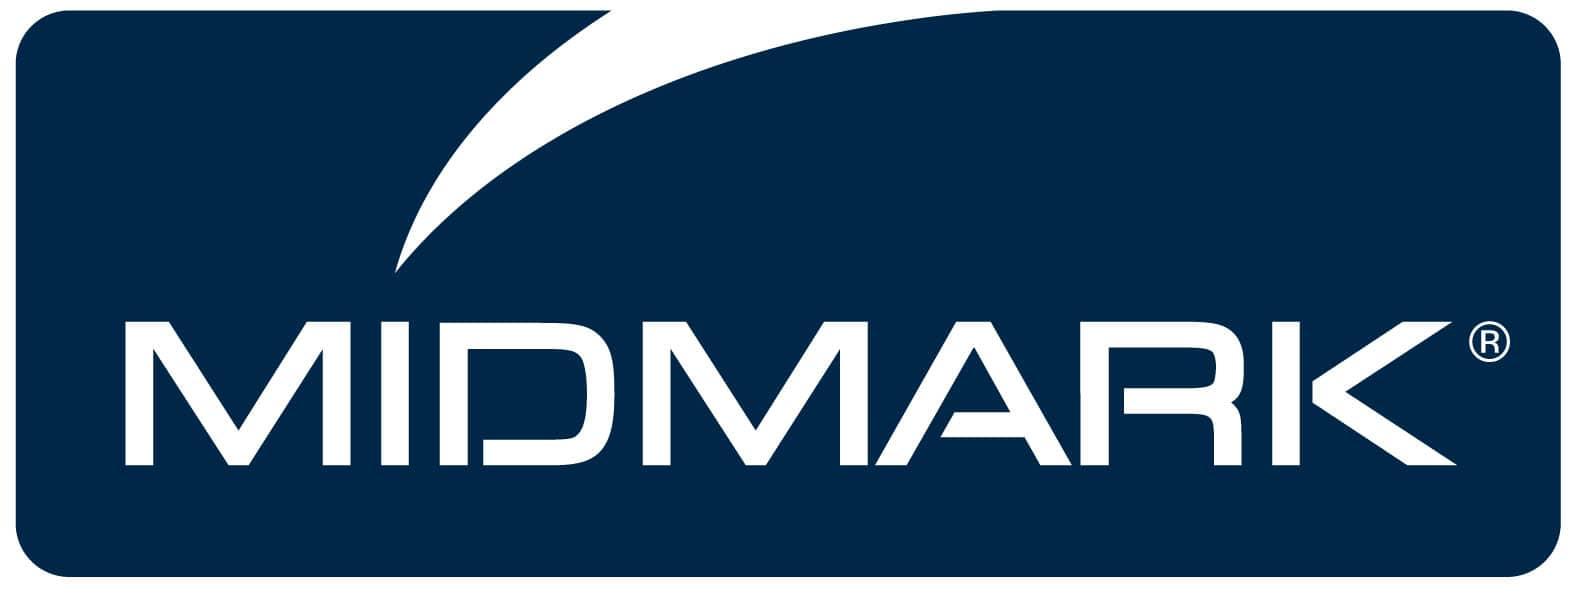 Midmark Corporation